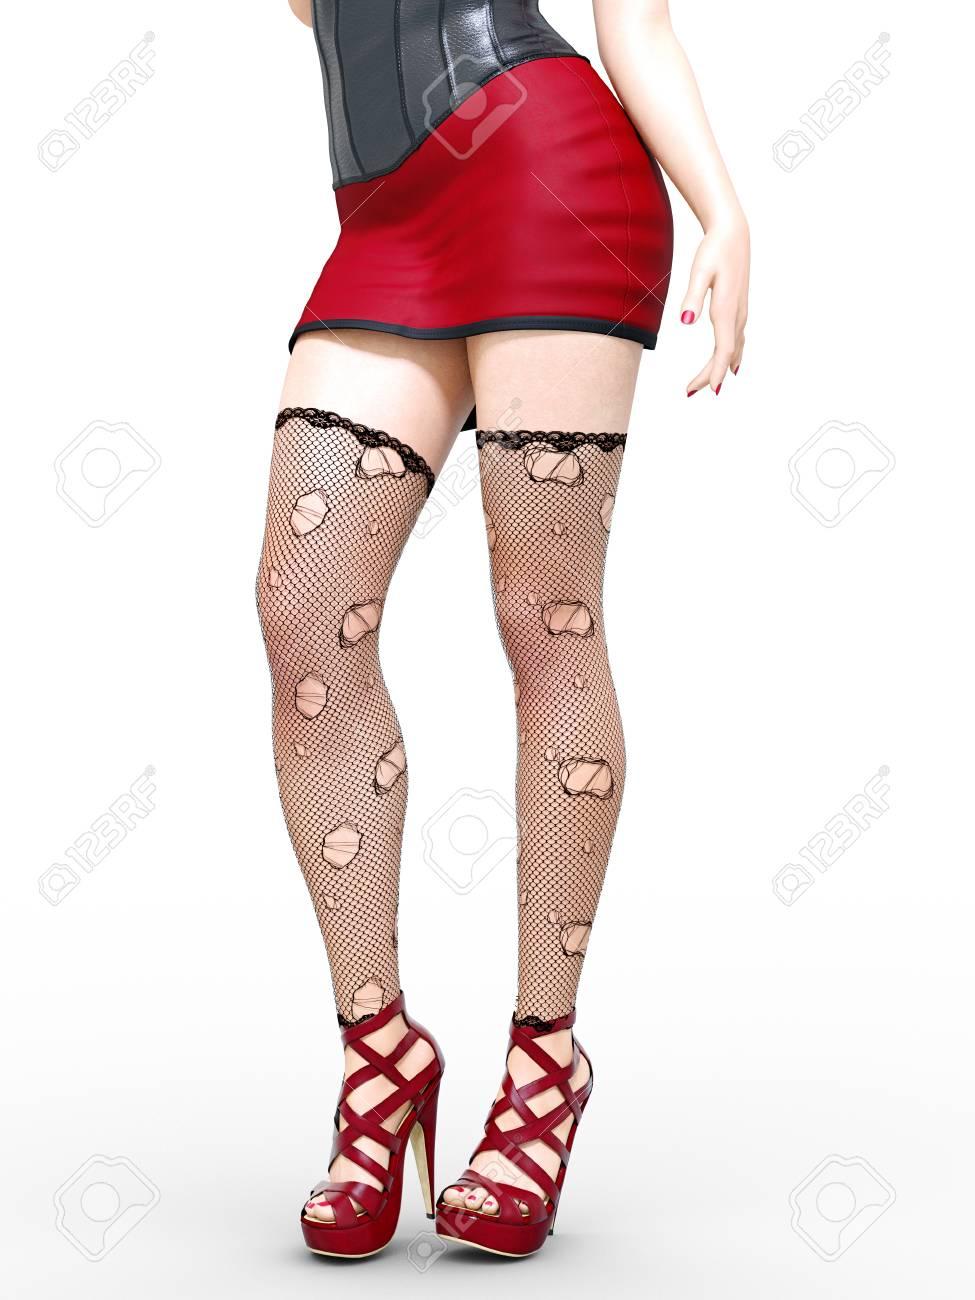 Mistress cuts off penis